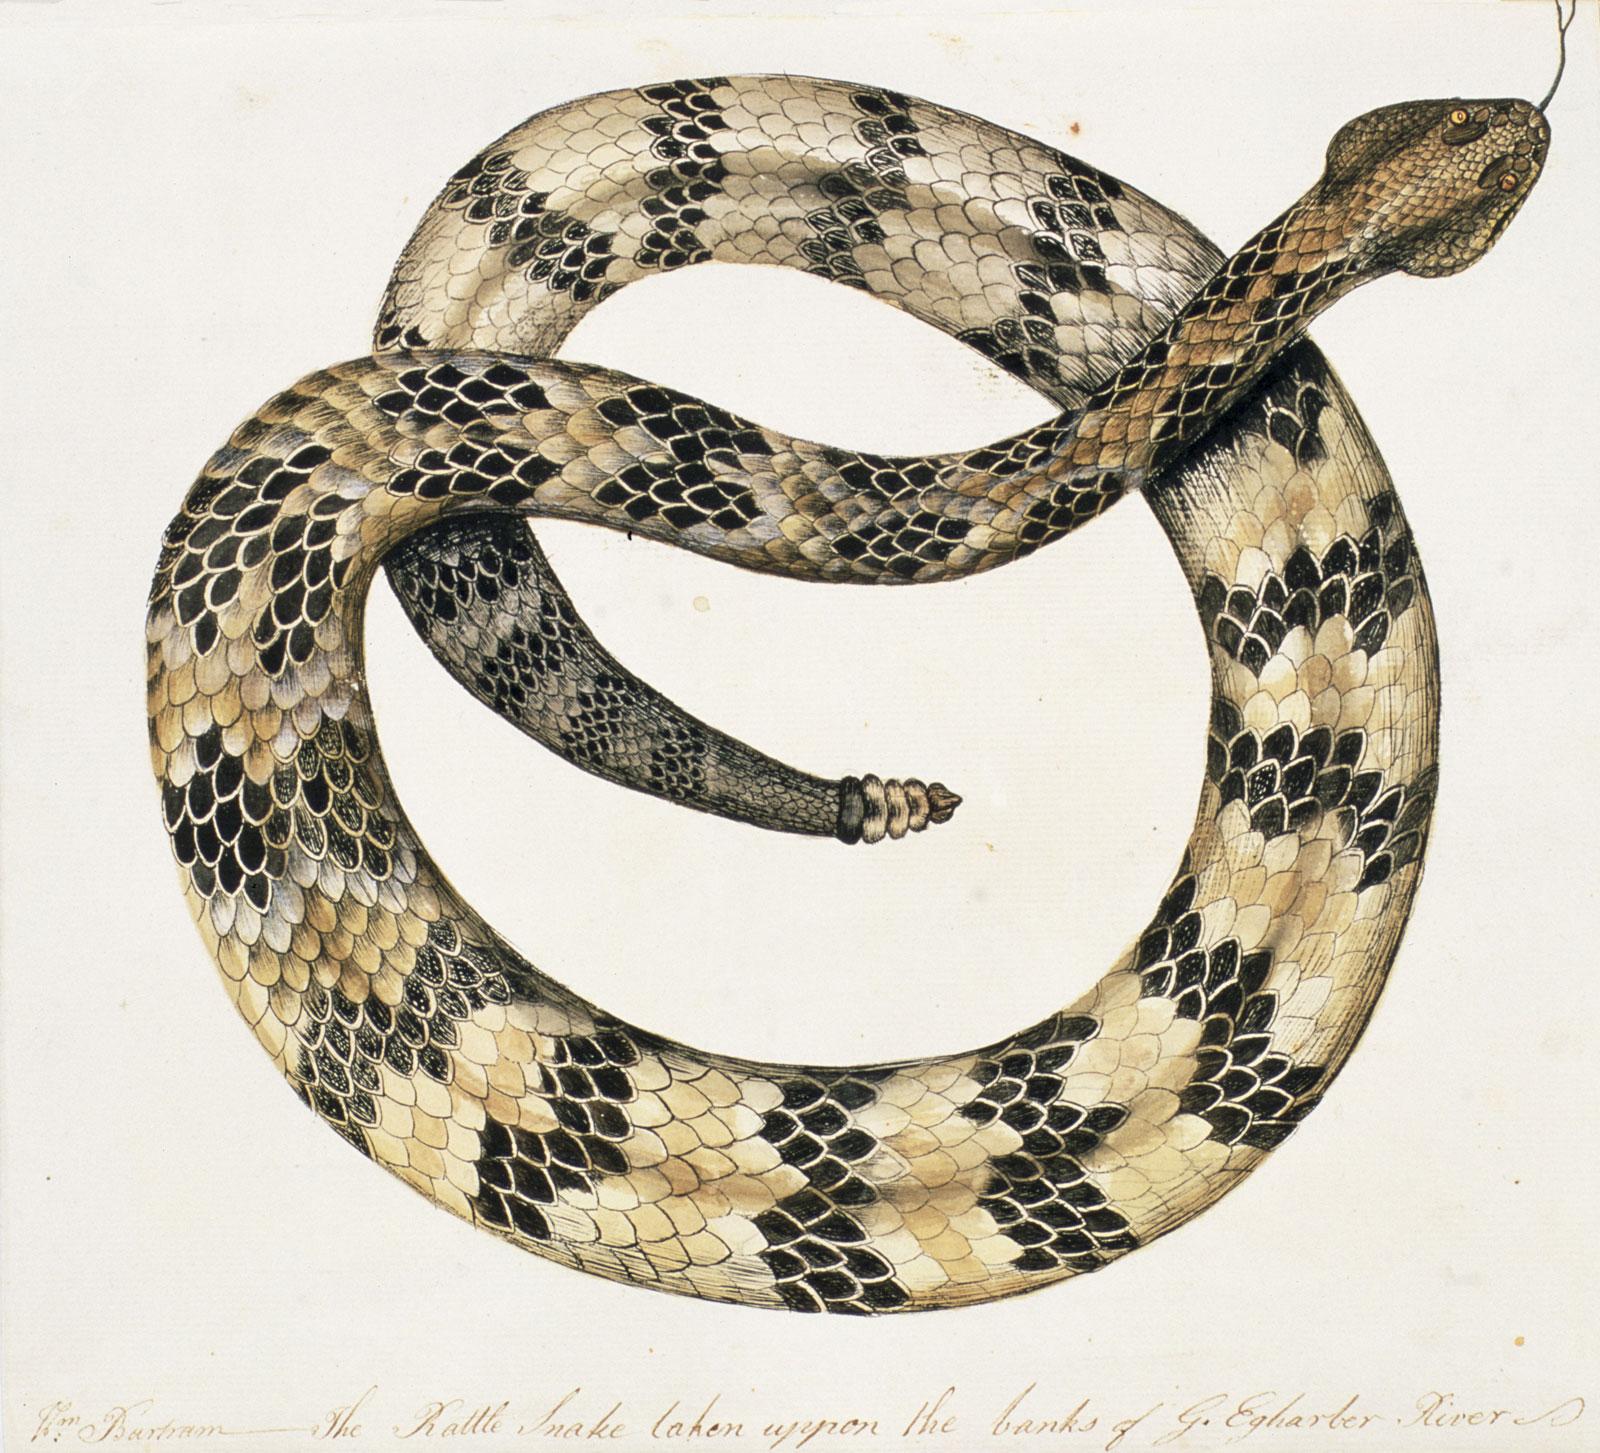 William Bartram: The Rattle Snake, late eighteenth century